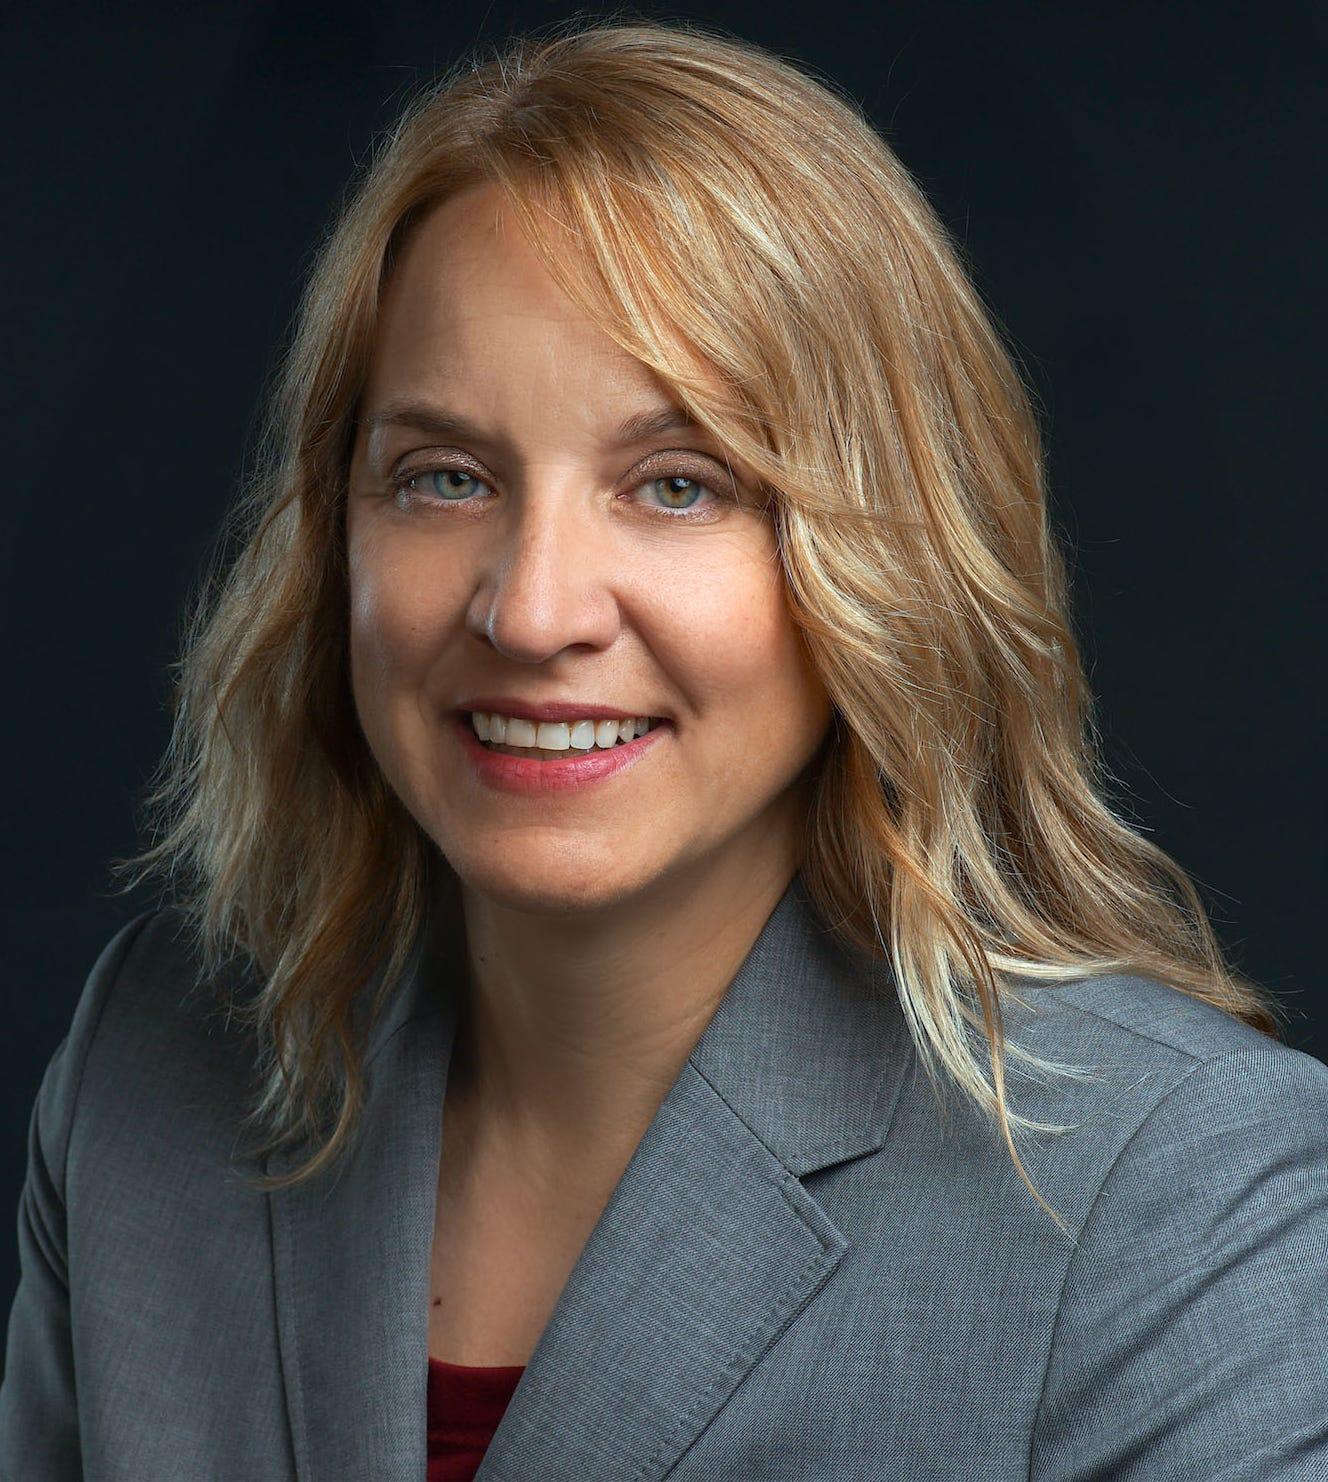 Library Director Paula Brehm-Heeger